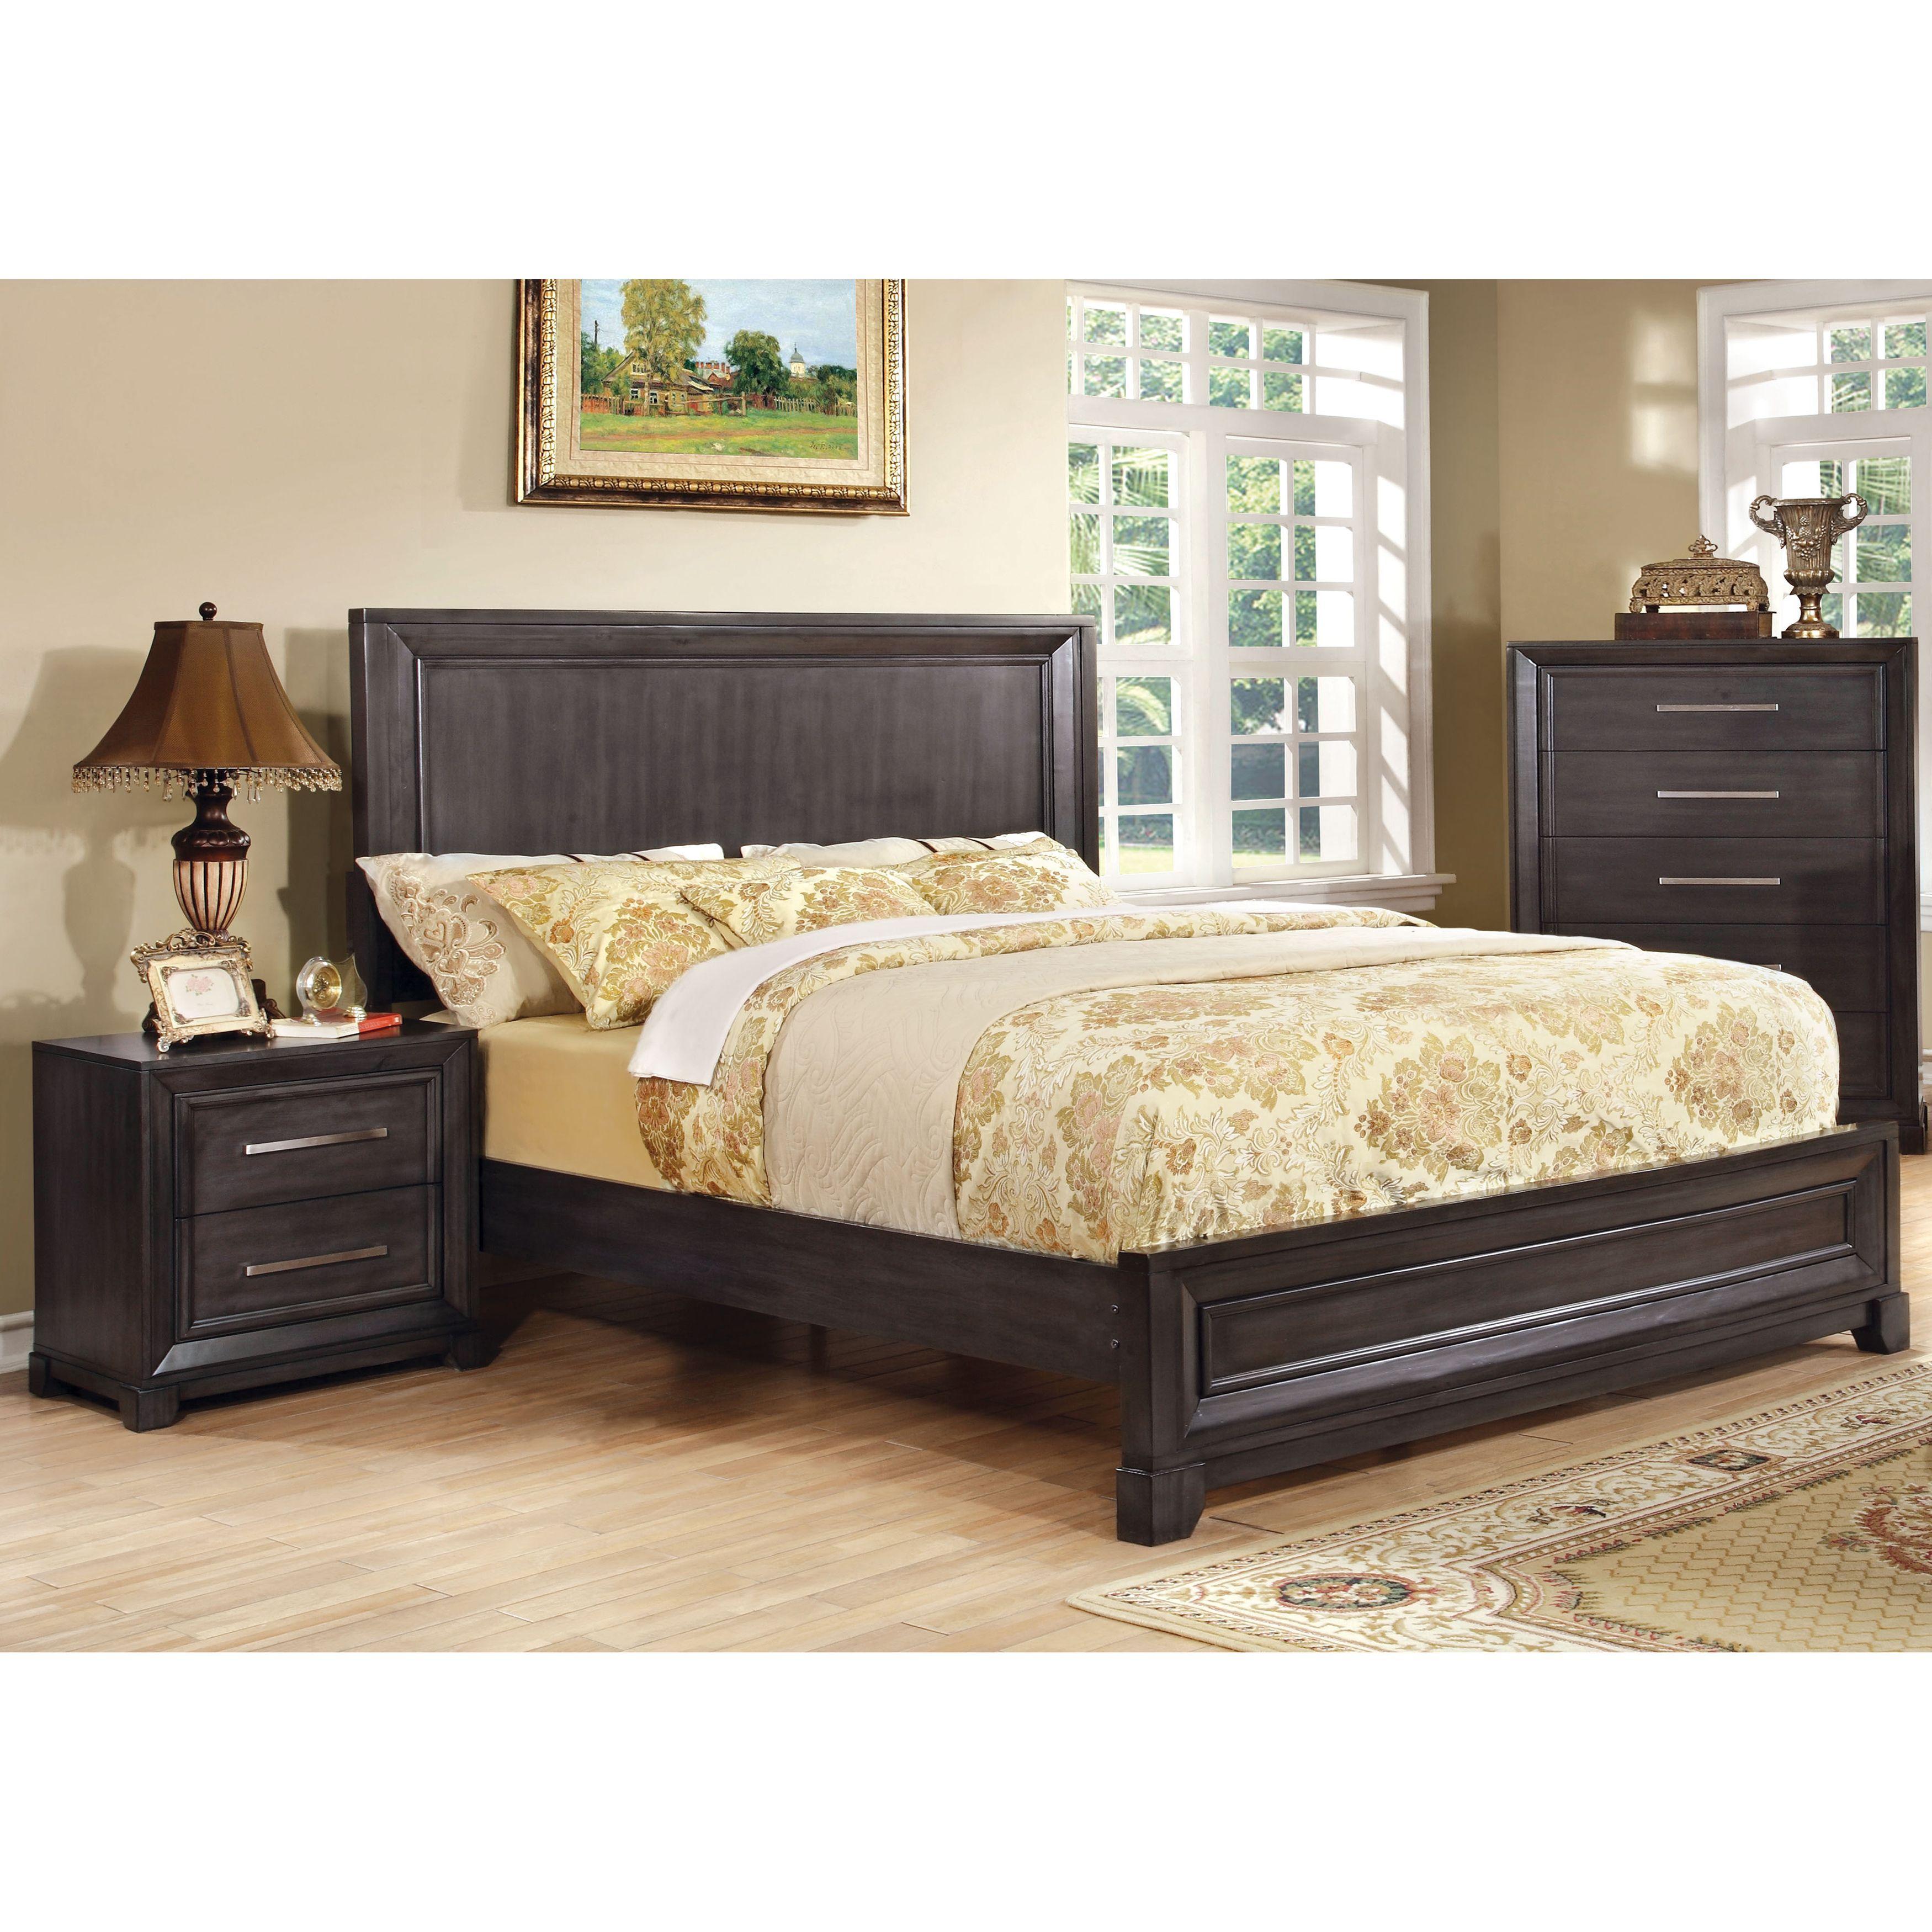 furniture of america stoneward dark grey 2 piece bed and nightstand